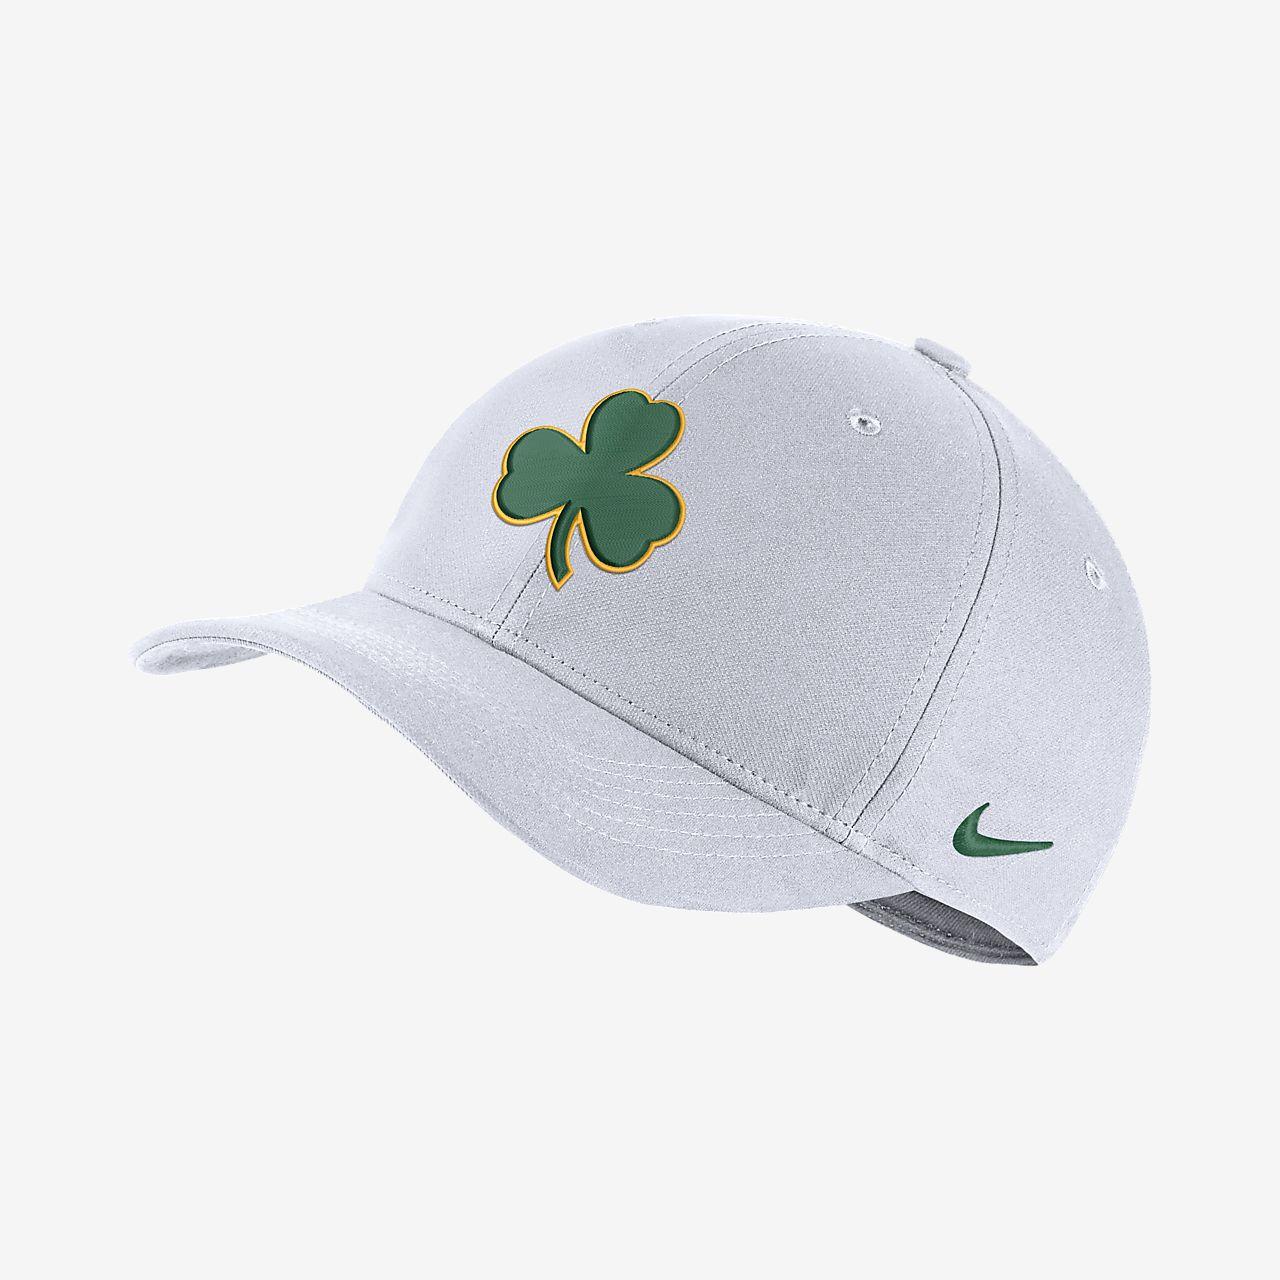 Boston Celtics City Edition Nike AeroBill Classic99 NBA 帽款